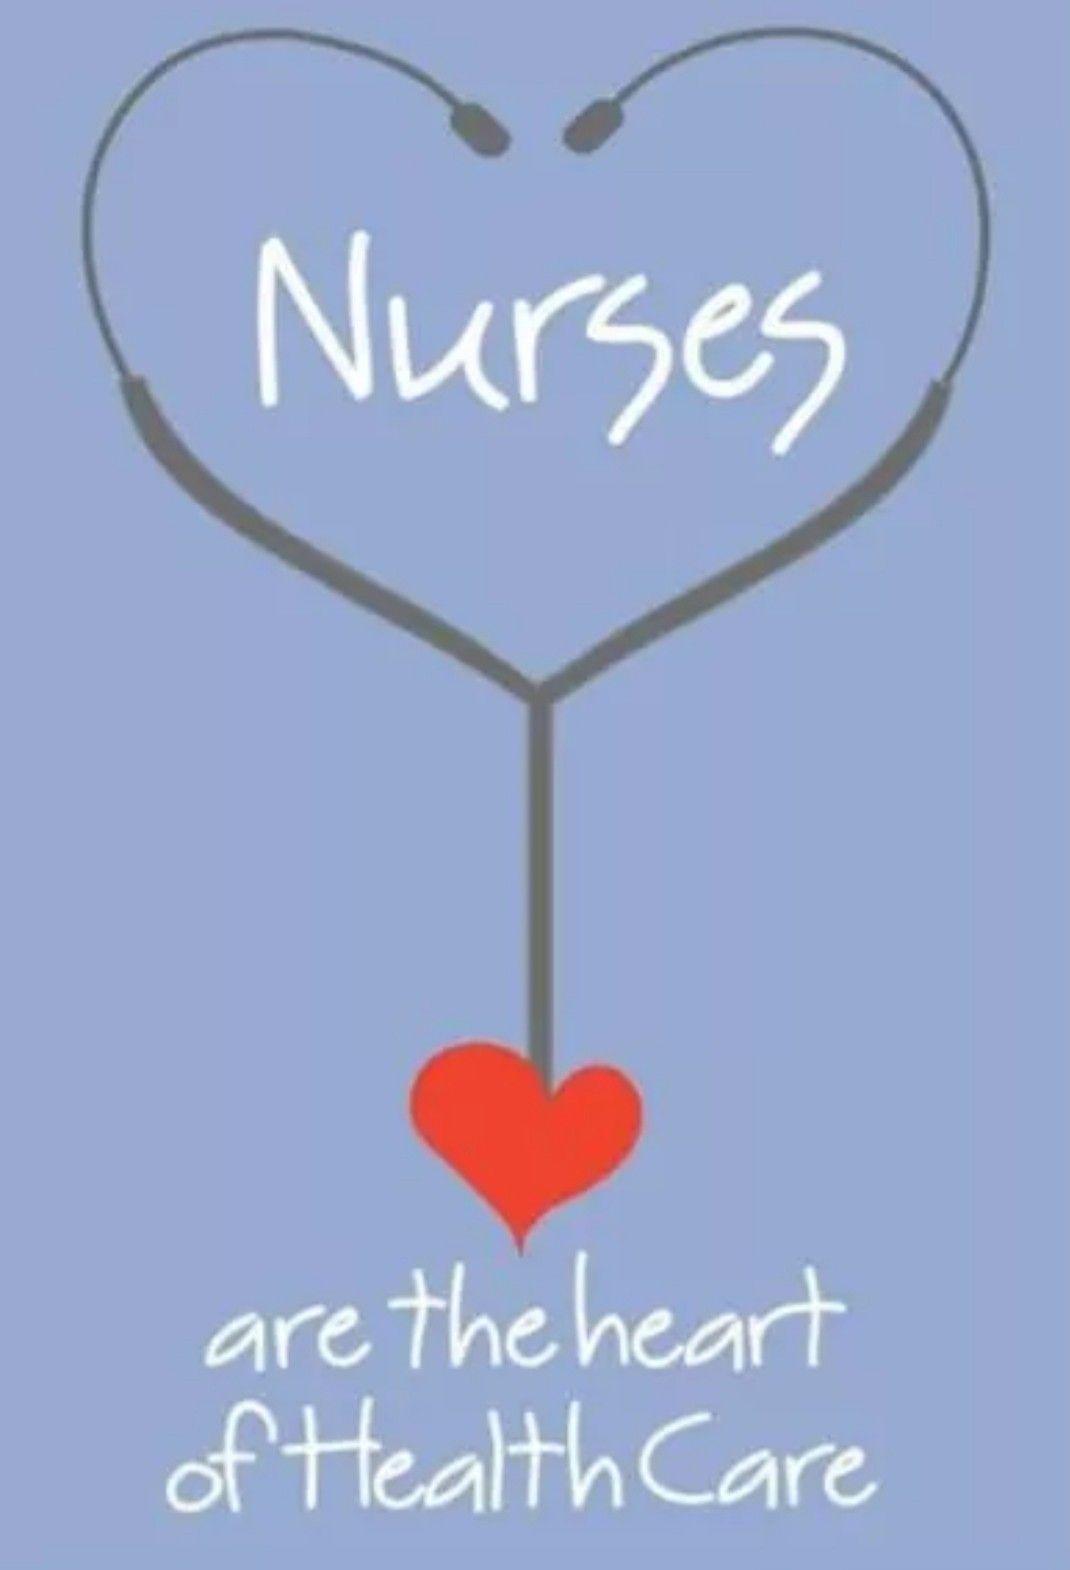 Pin by Melissa on Nurse stuff Funny nurse quotes